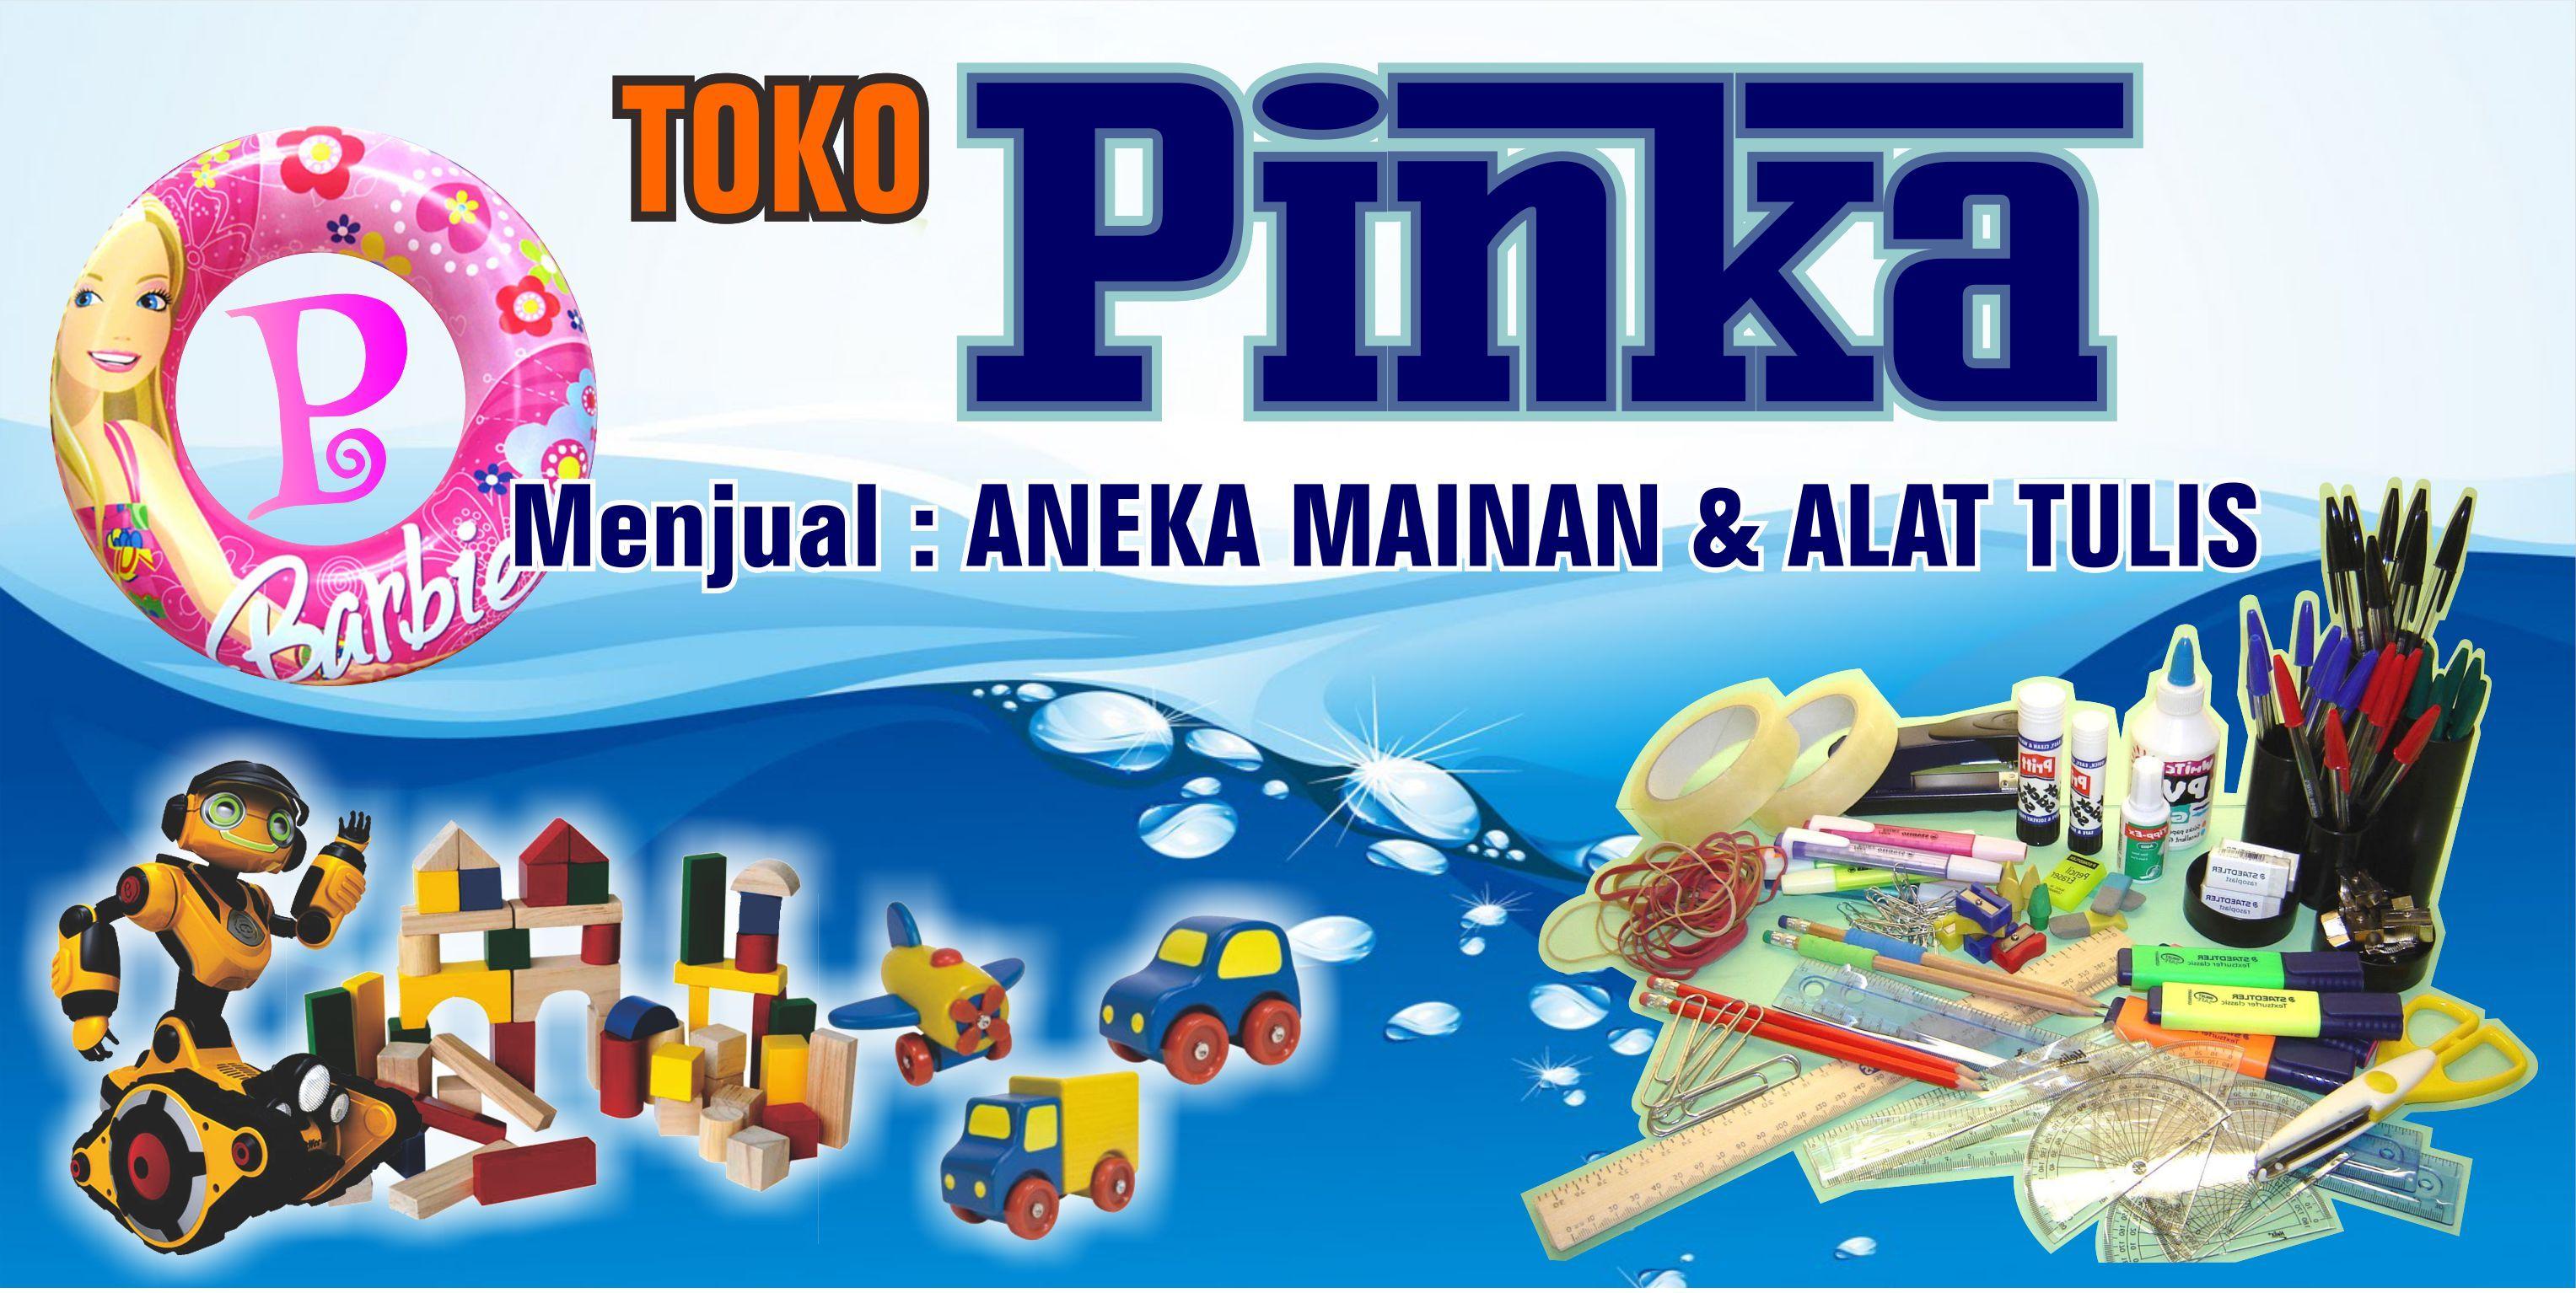 10+ Best For Contoh Banner Toko Mainan Anak